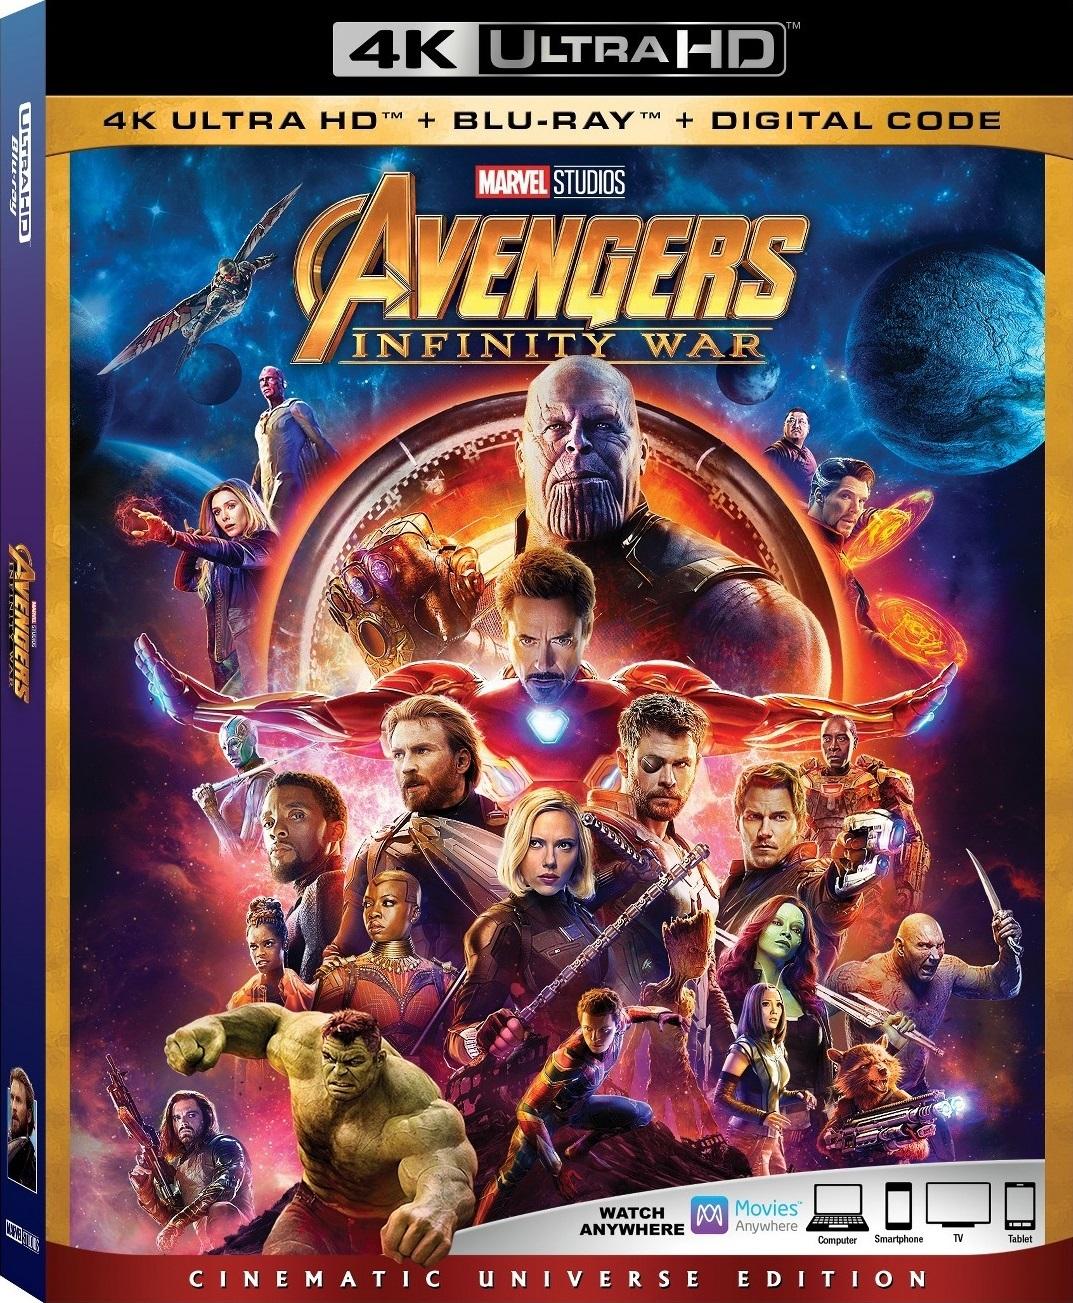 Avengers: Infinity War (2018) poster image